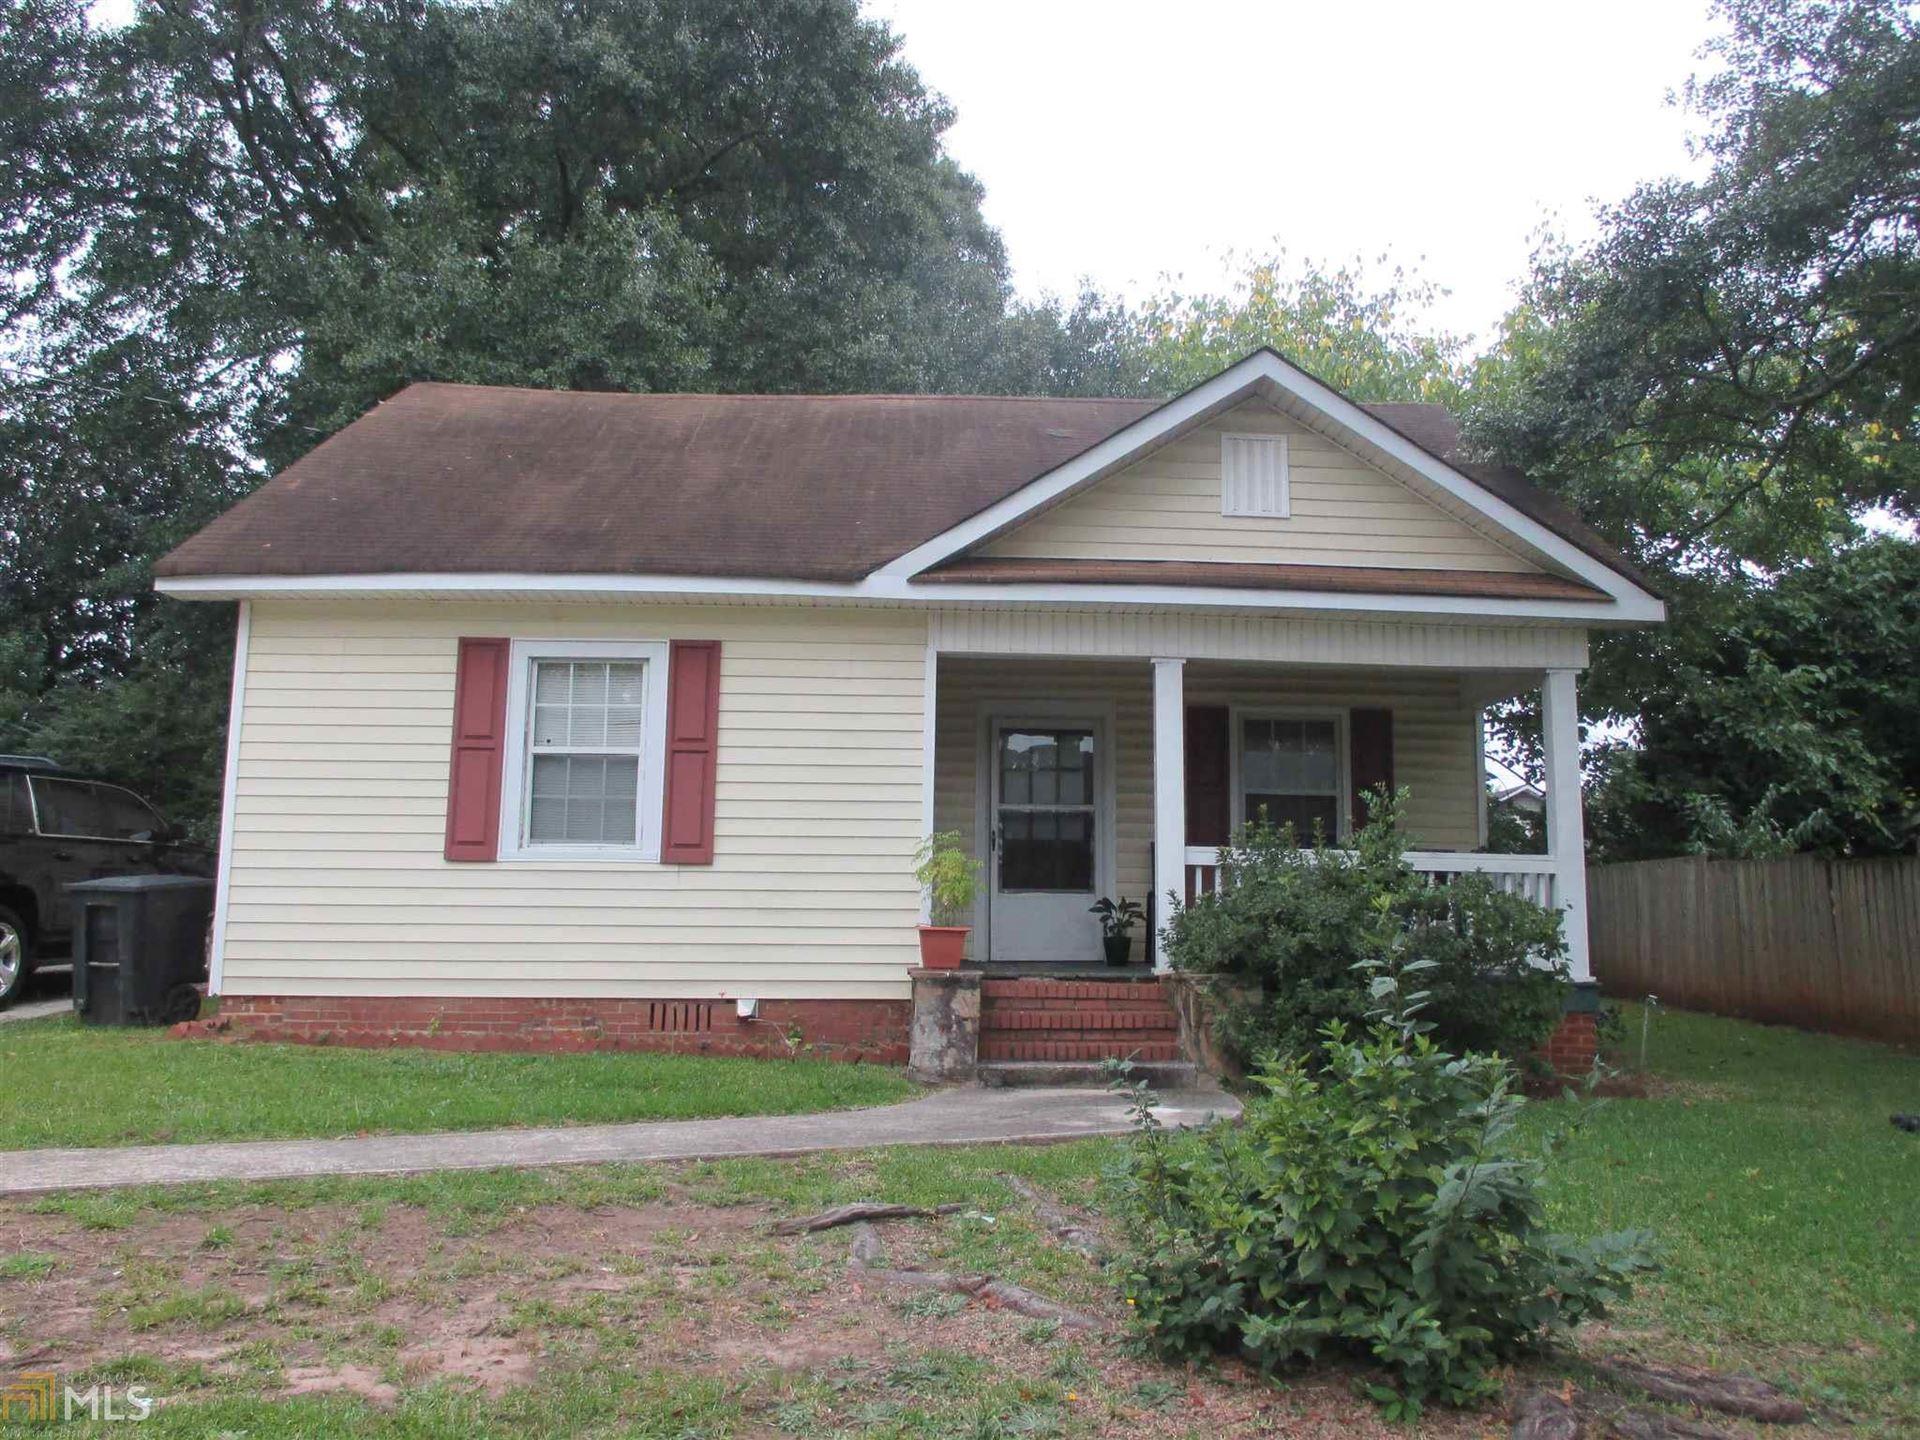 615 South Church St, Thomaston, GA 30286 - MLS#: 8857257